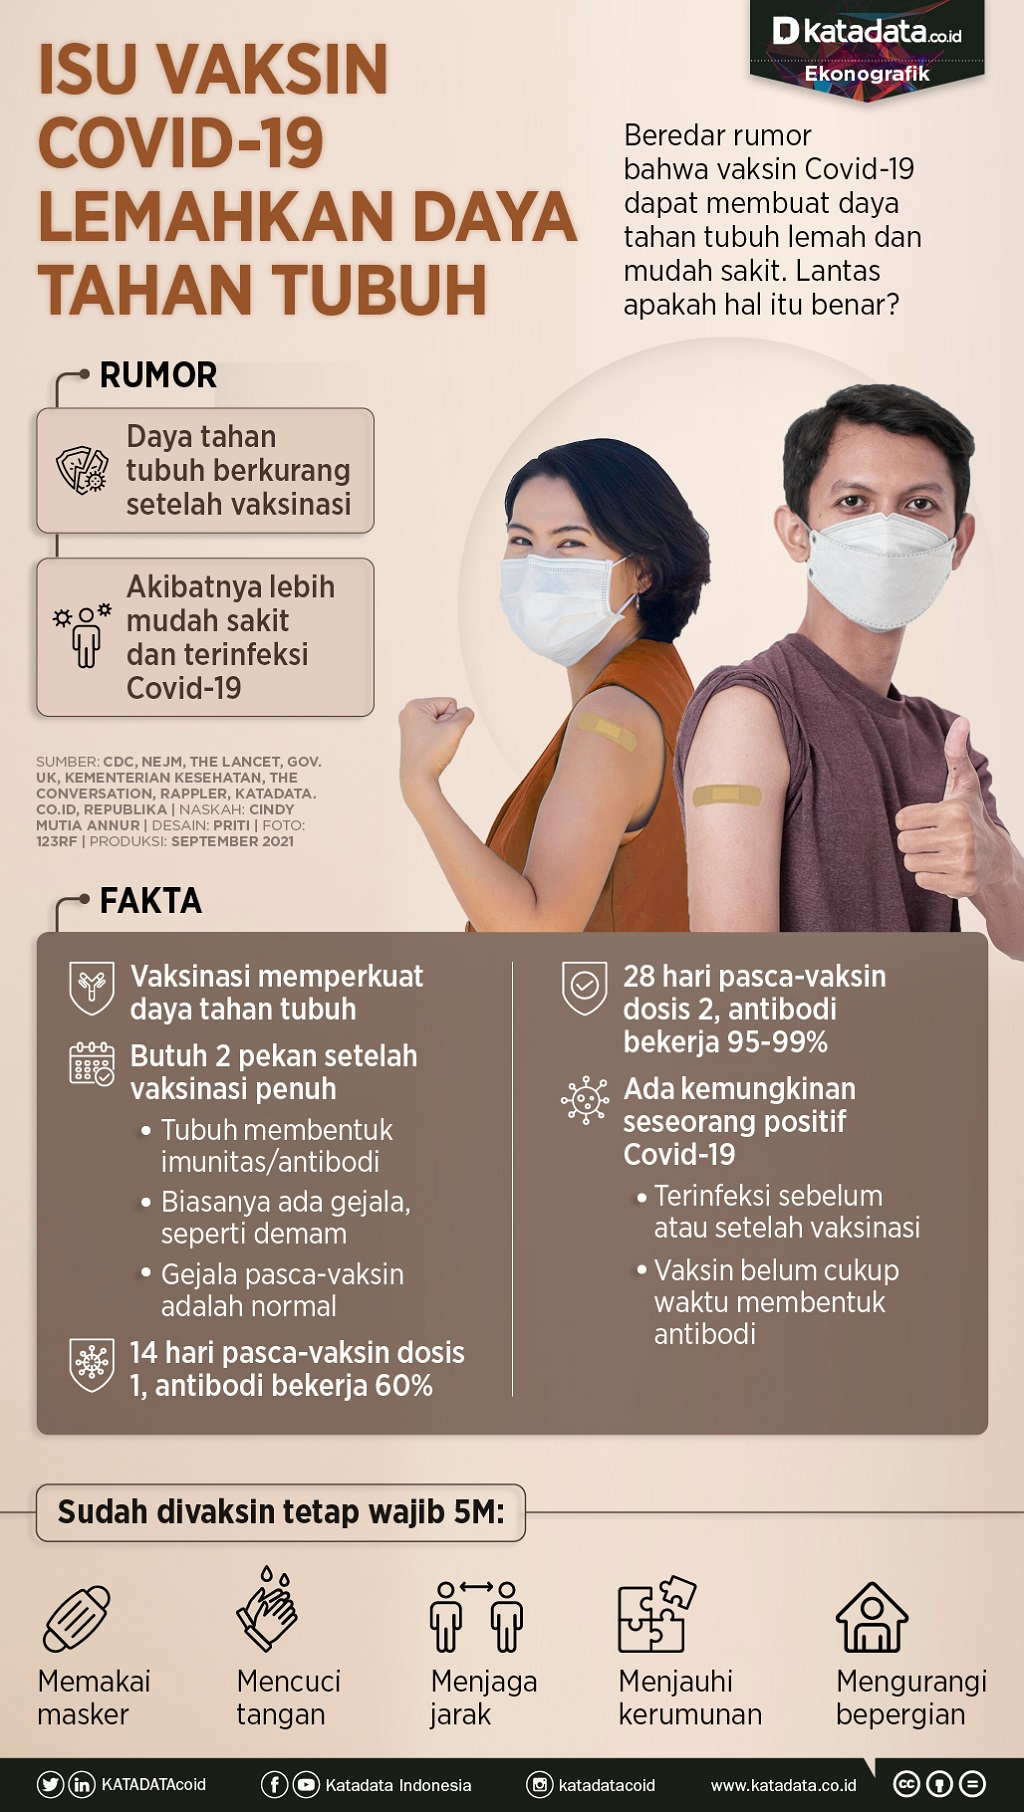 Infografik_Isu vaksin covid-19 lemahkan daya tahan tubuh